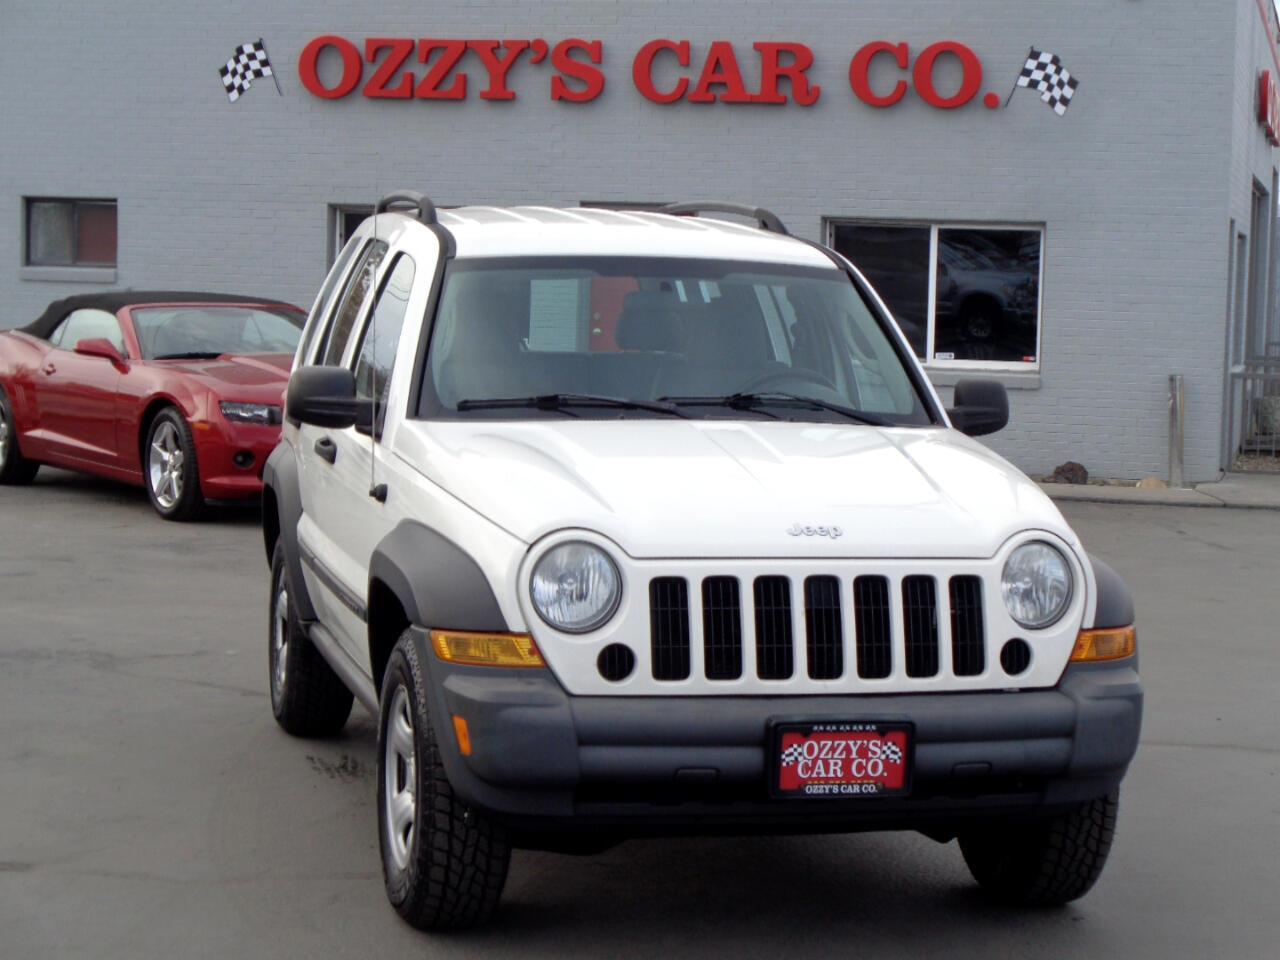 2007 Jeep Liberty 4WD 4dr Sport